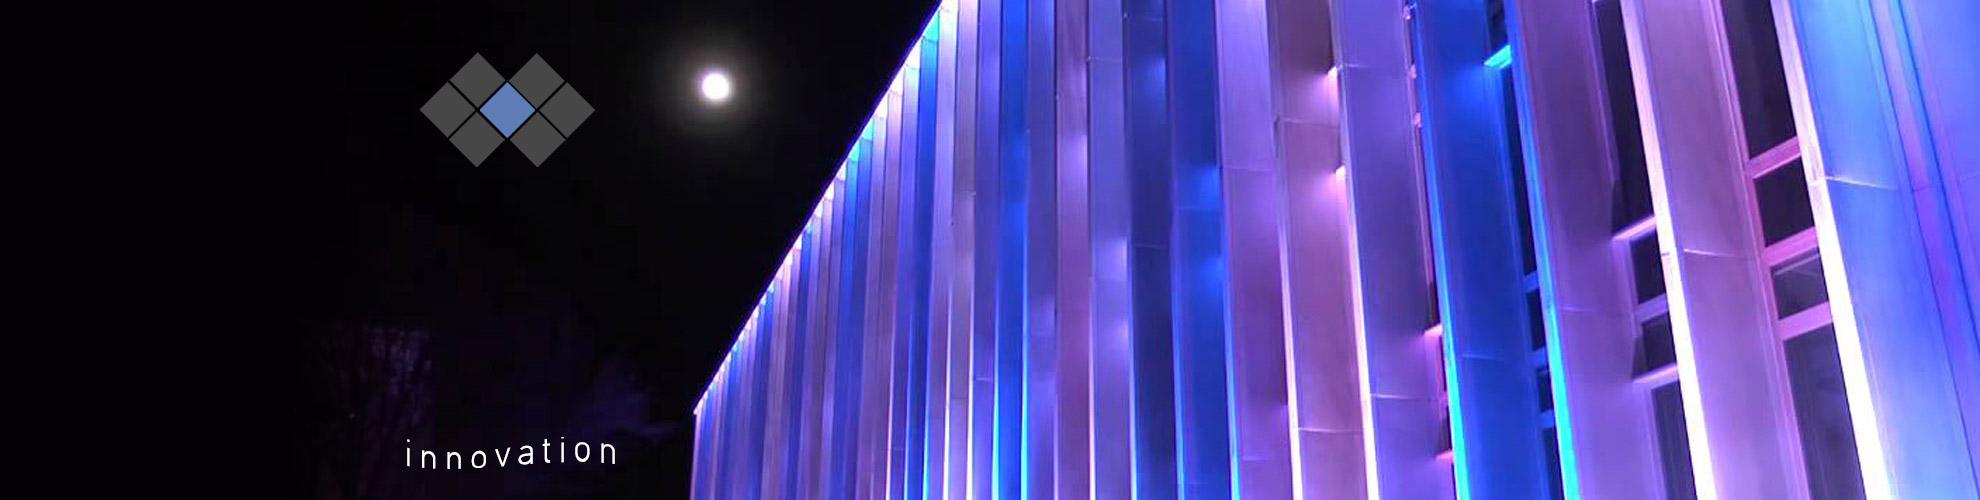 Banner_LED_Facades